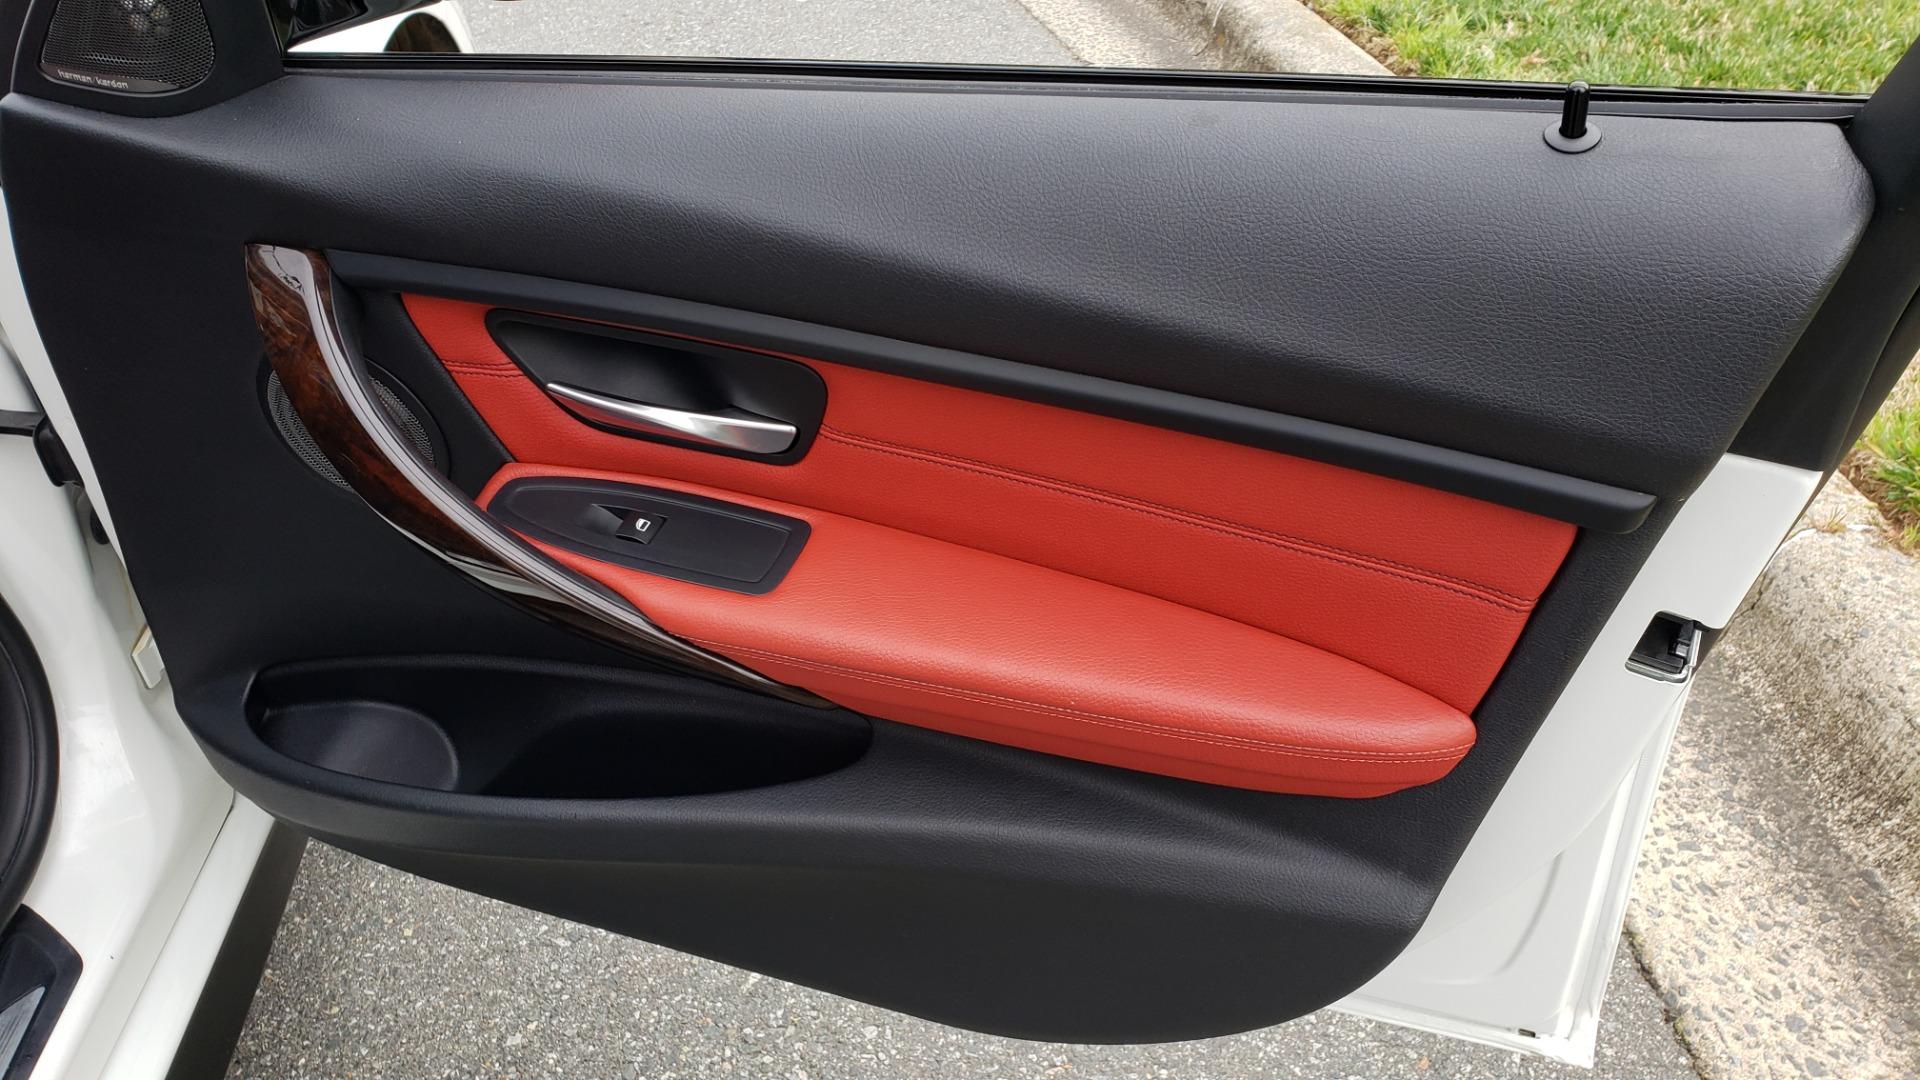 Used 2015 BMW 3 Series 335I M-SPORT / PREM PKG / HK SND / SUNROOF / REARVIEW for sale Sold at Formula Imports in Charlotte NC 28227 64